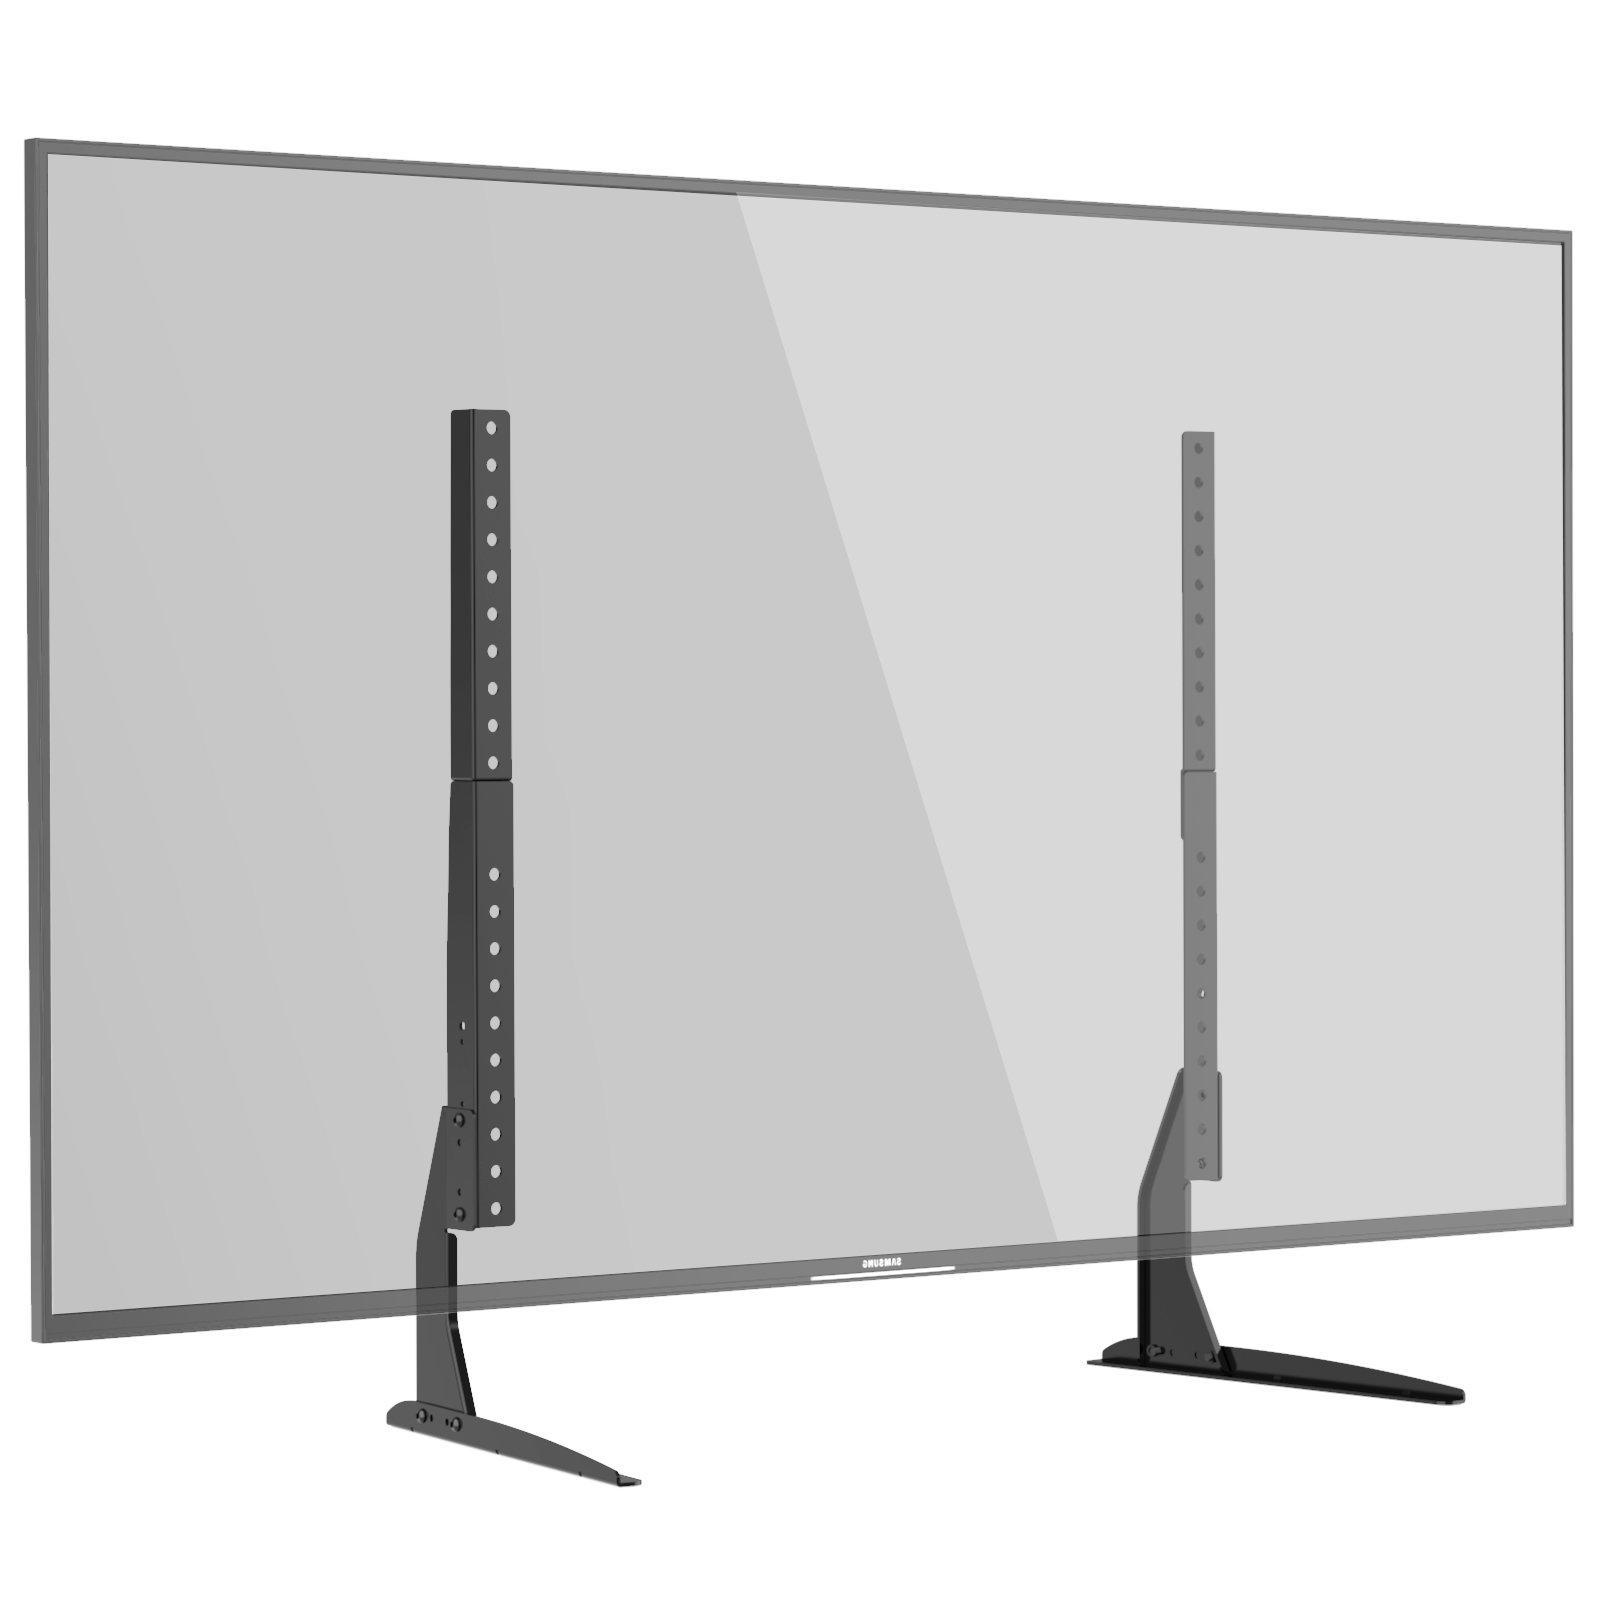 "1homefurnit Universal Tabletop TV Stand Pedestal Mount Monitor Riser fits 22""-65"" Screens Supports VESA 800x400mm, 600x400mm, 400x400mm, 400x200mm and 200x200mm"